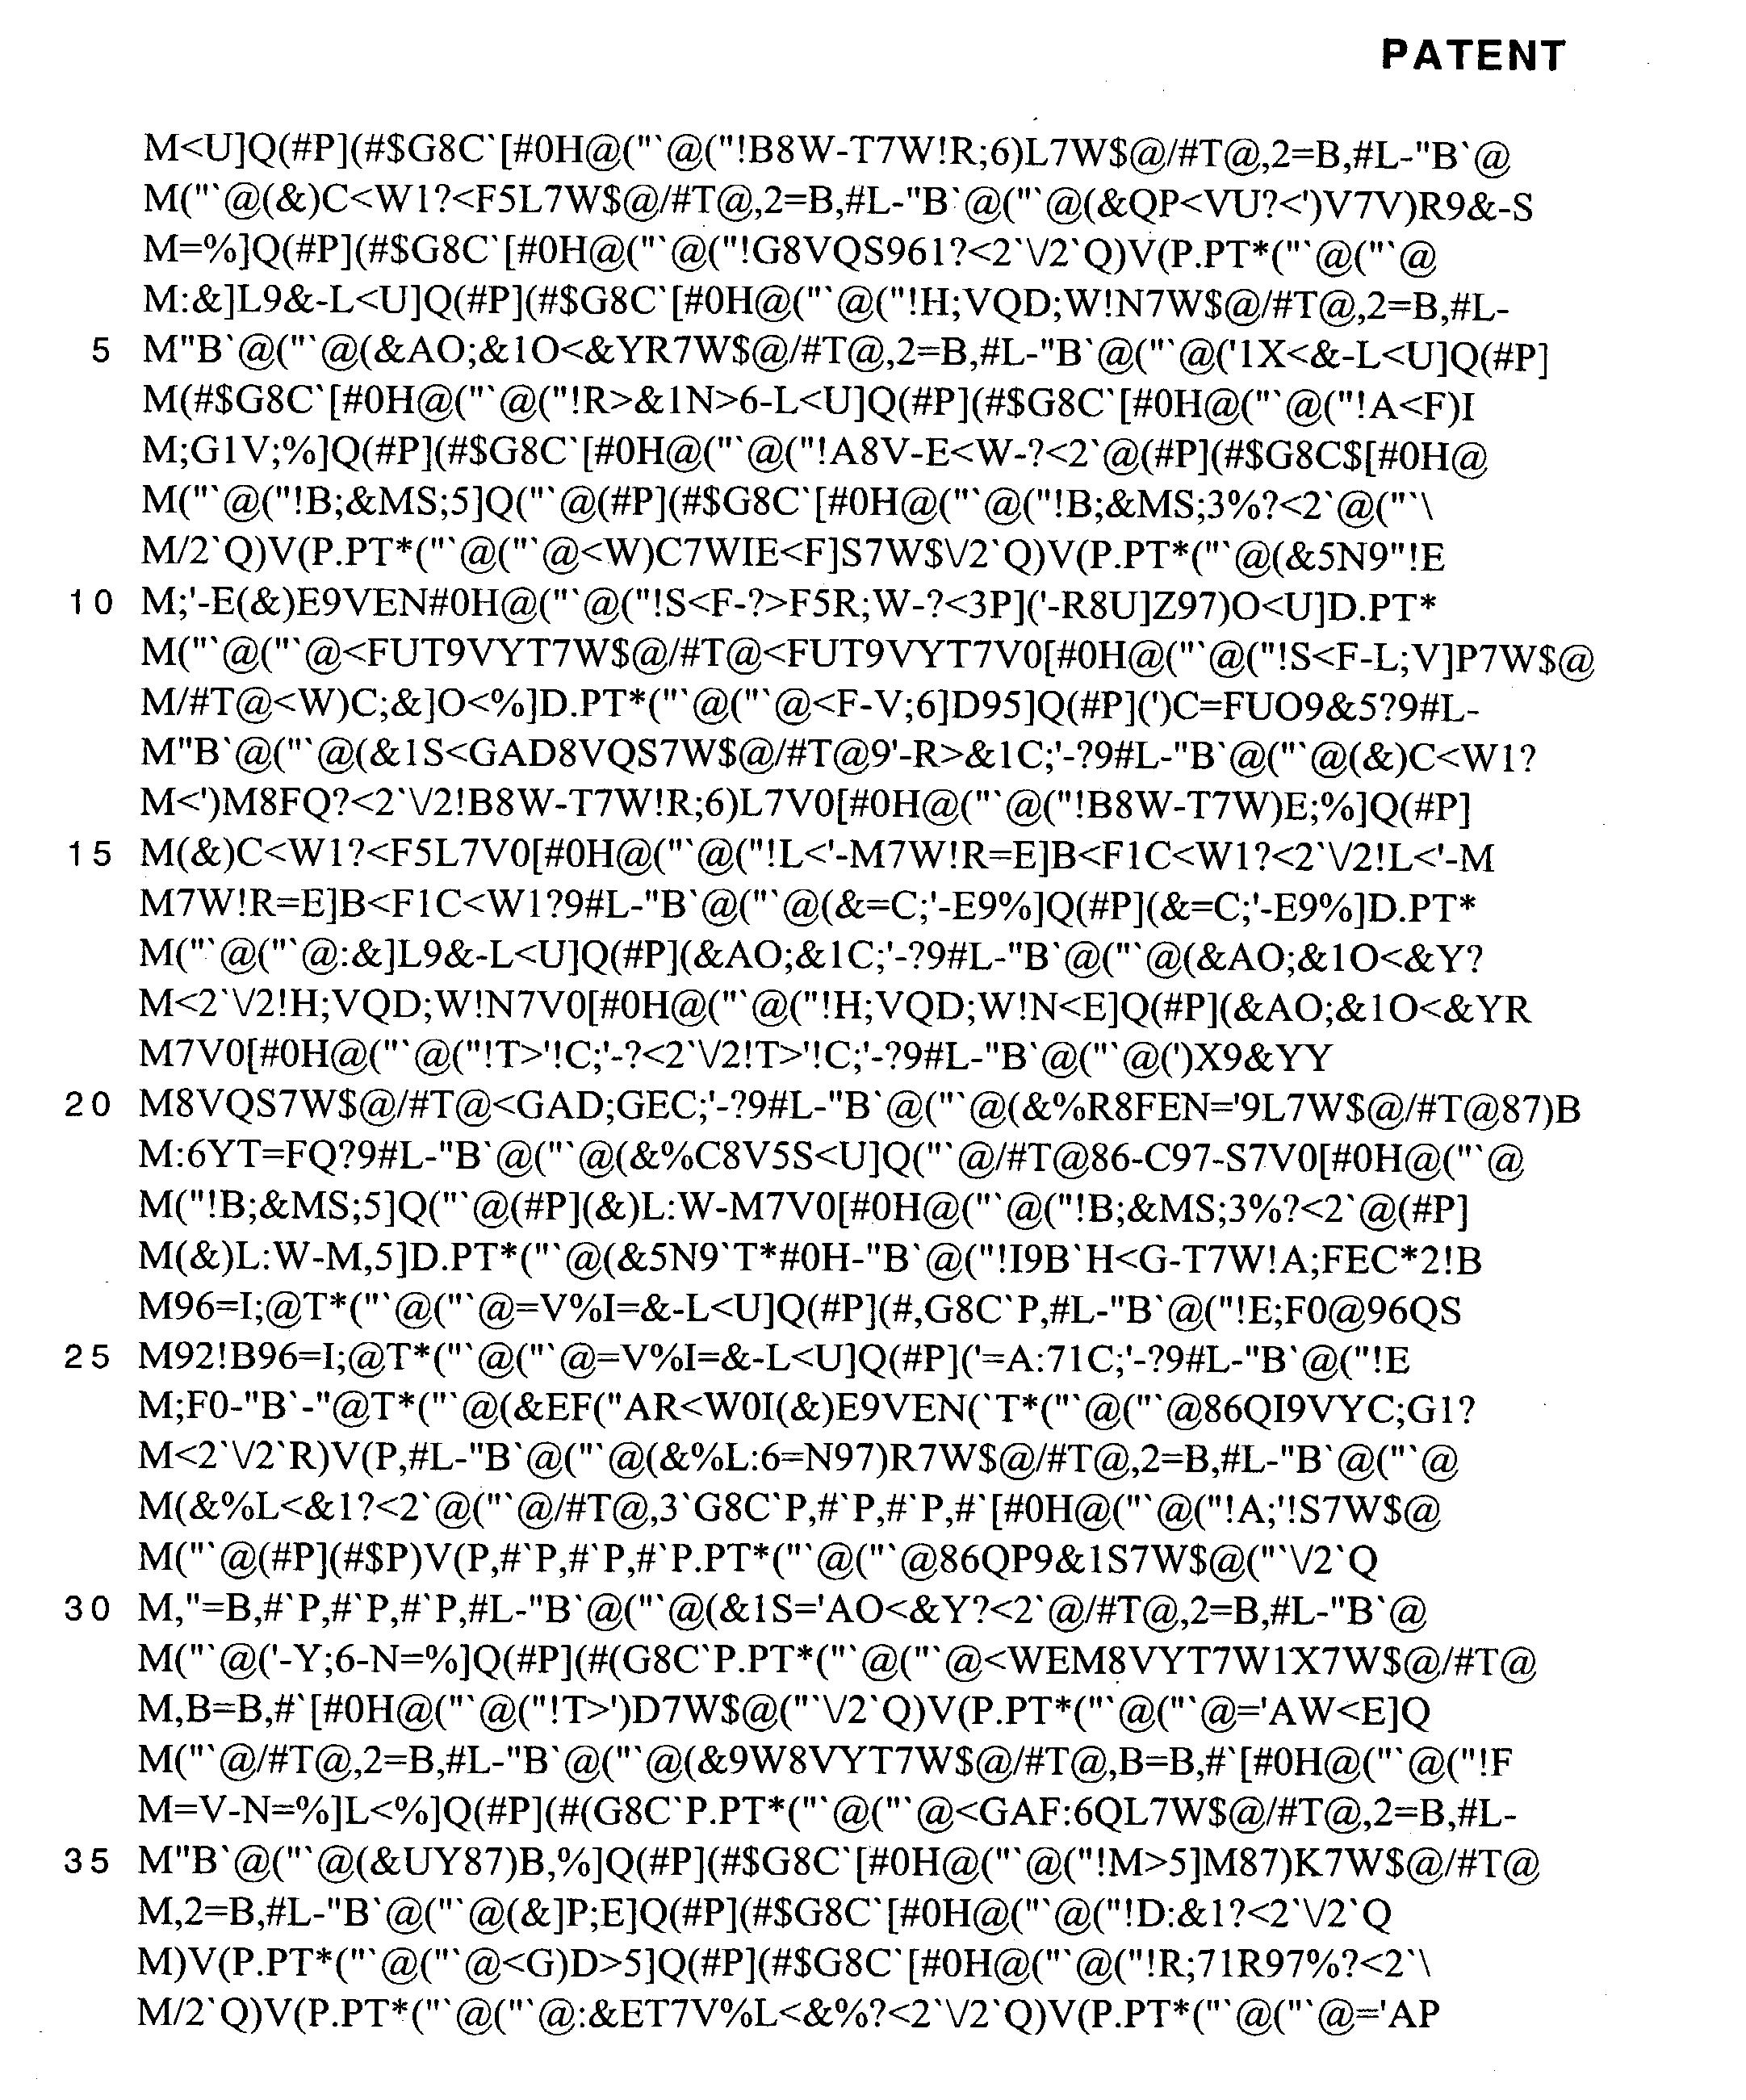 Figure US20030174721A1-20030918-P00065